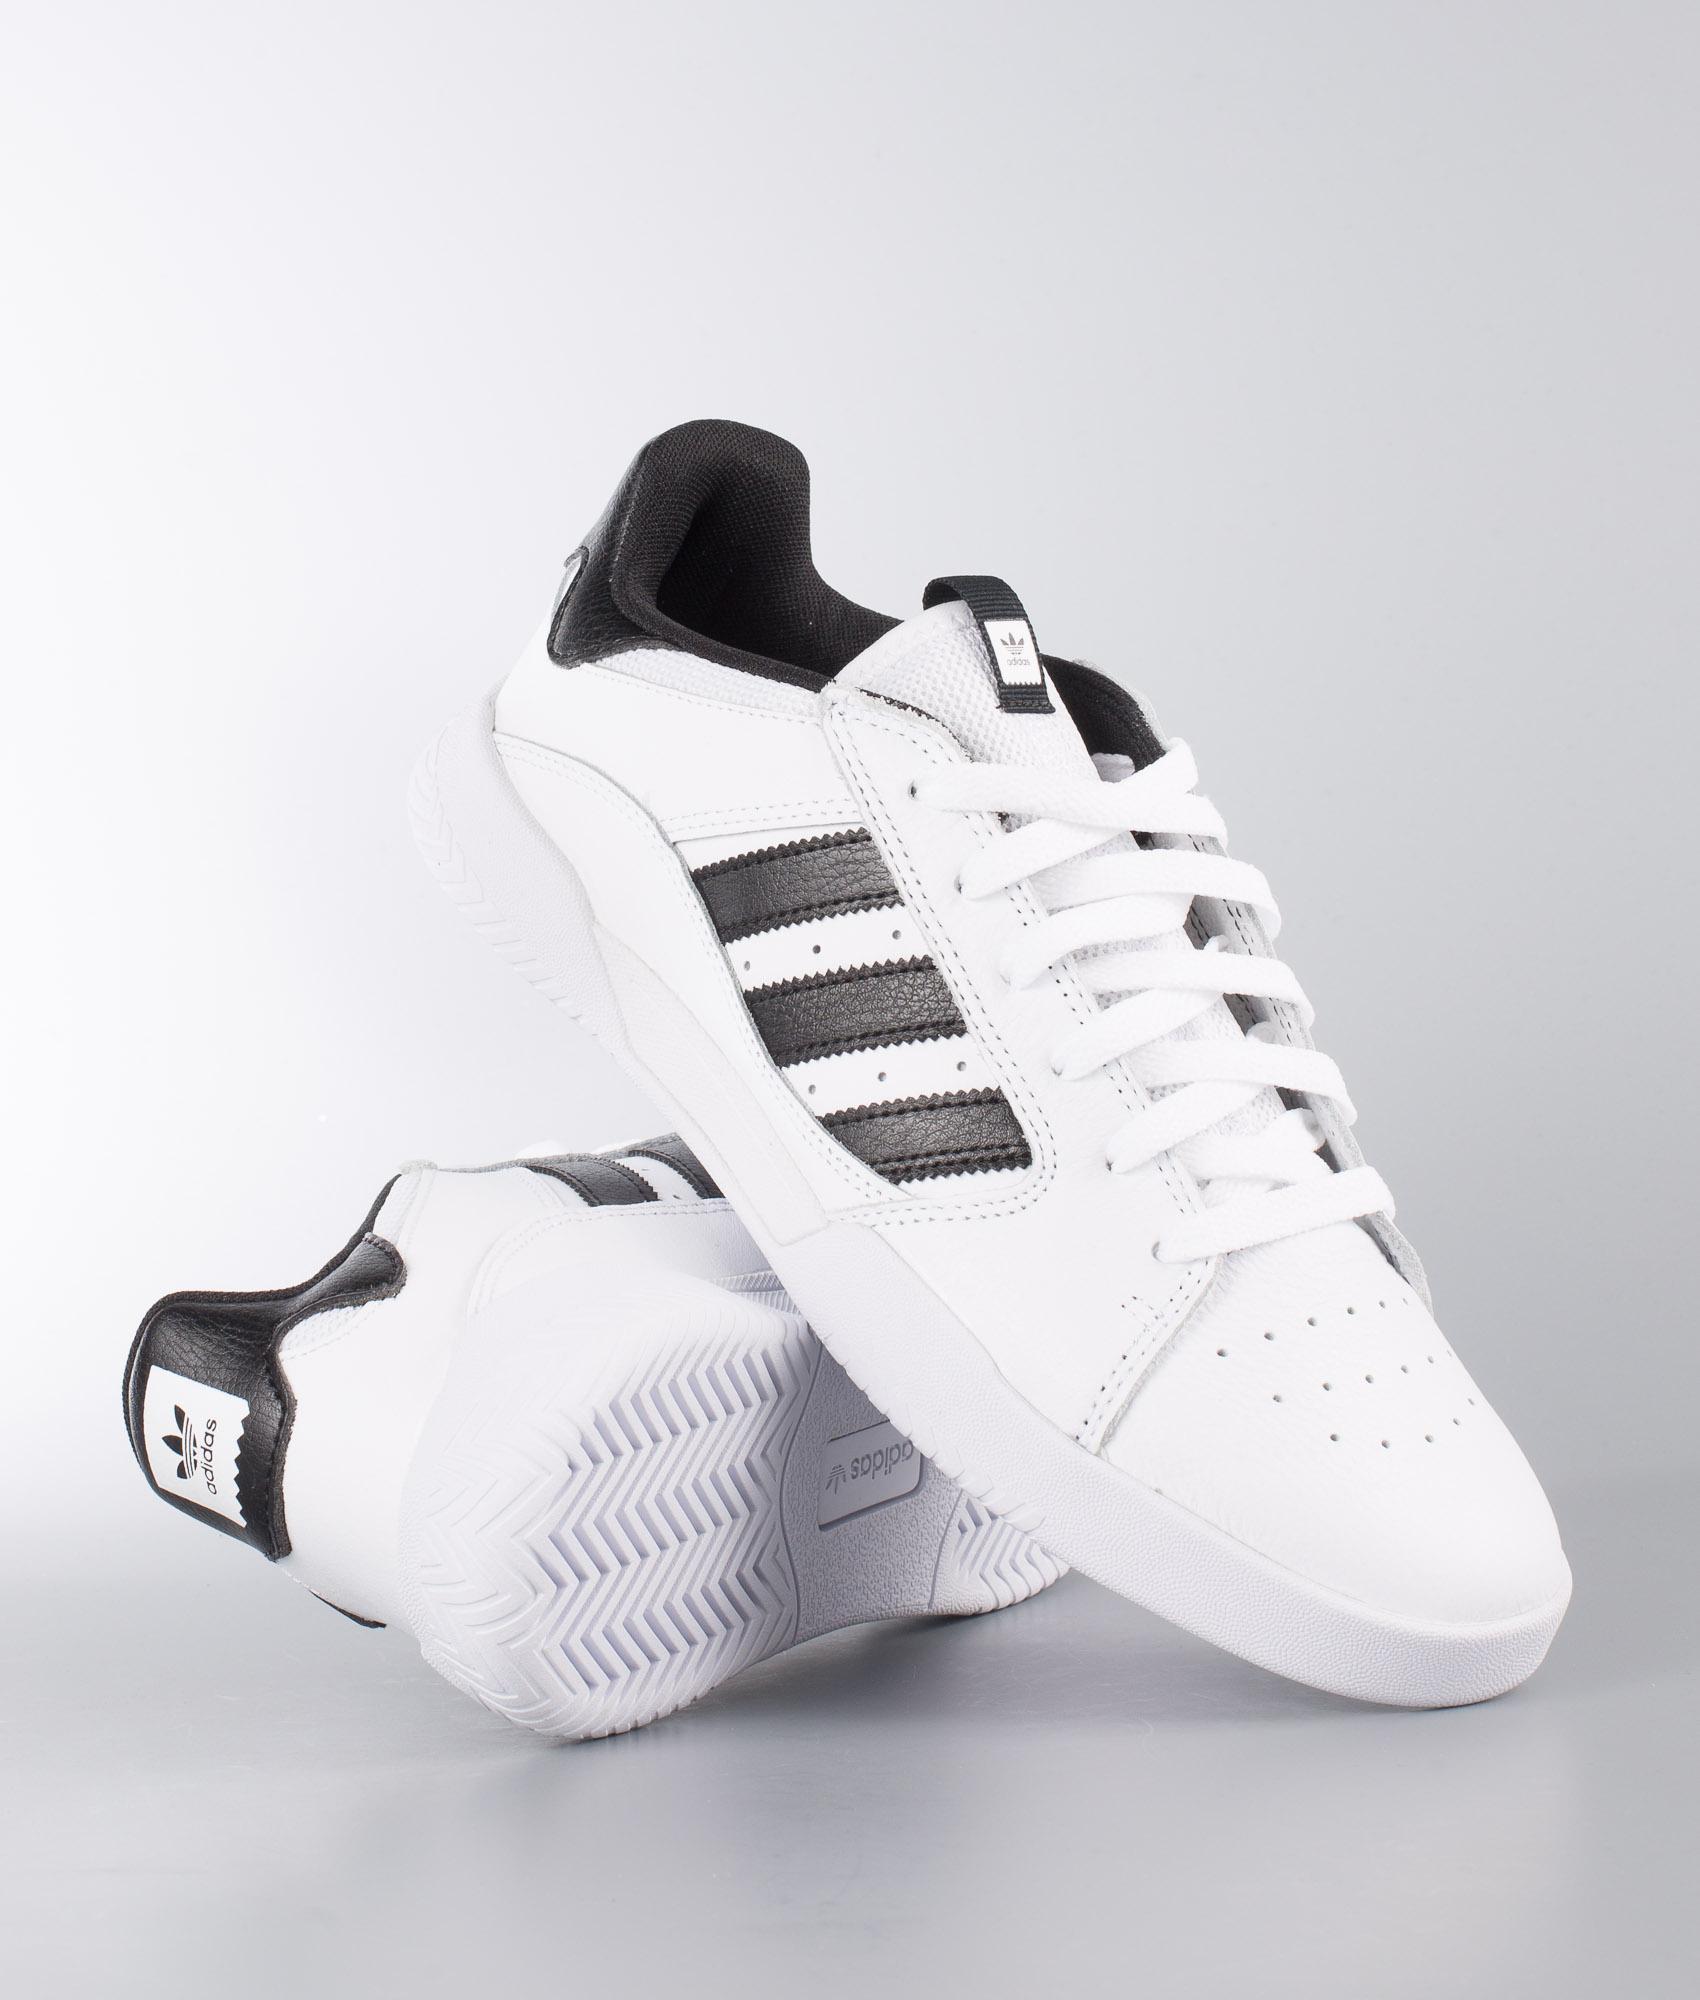 Adidas Whitecore Skateboarding Scarpe Low White Ftwr Blackftwr Vrx Orz7Ofq